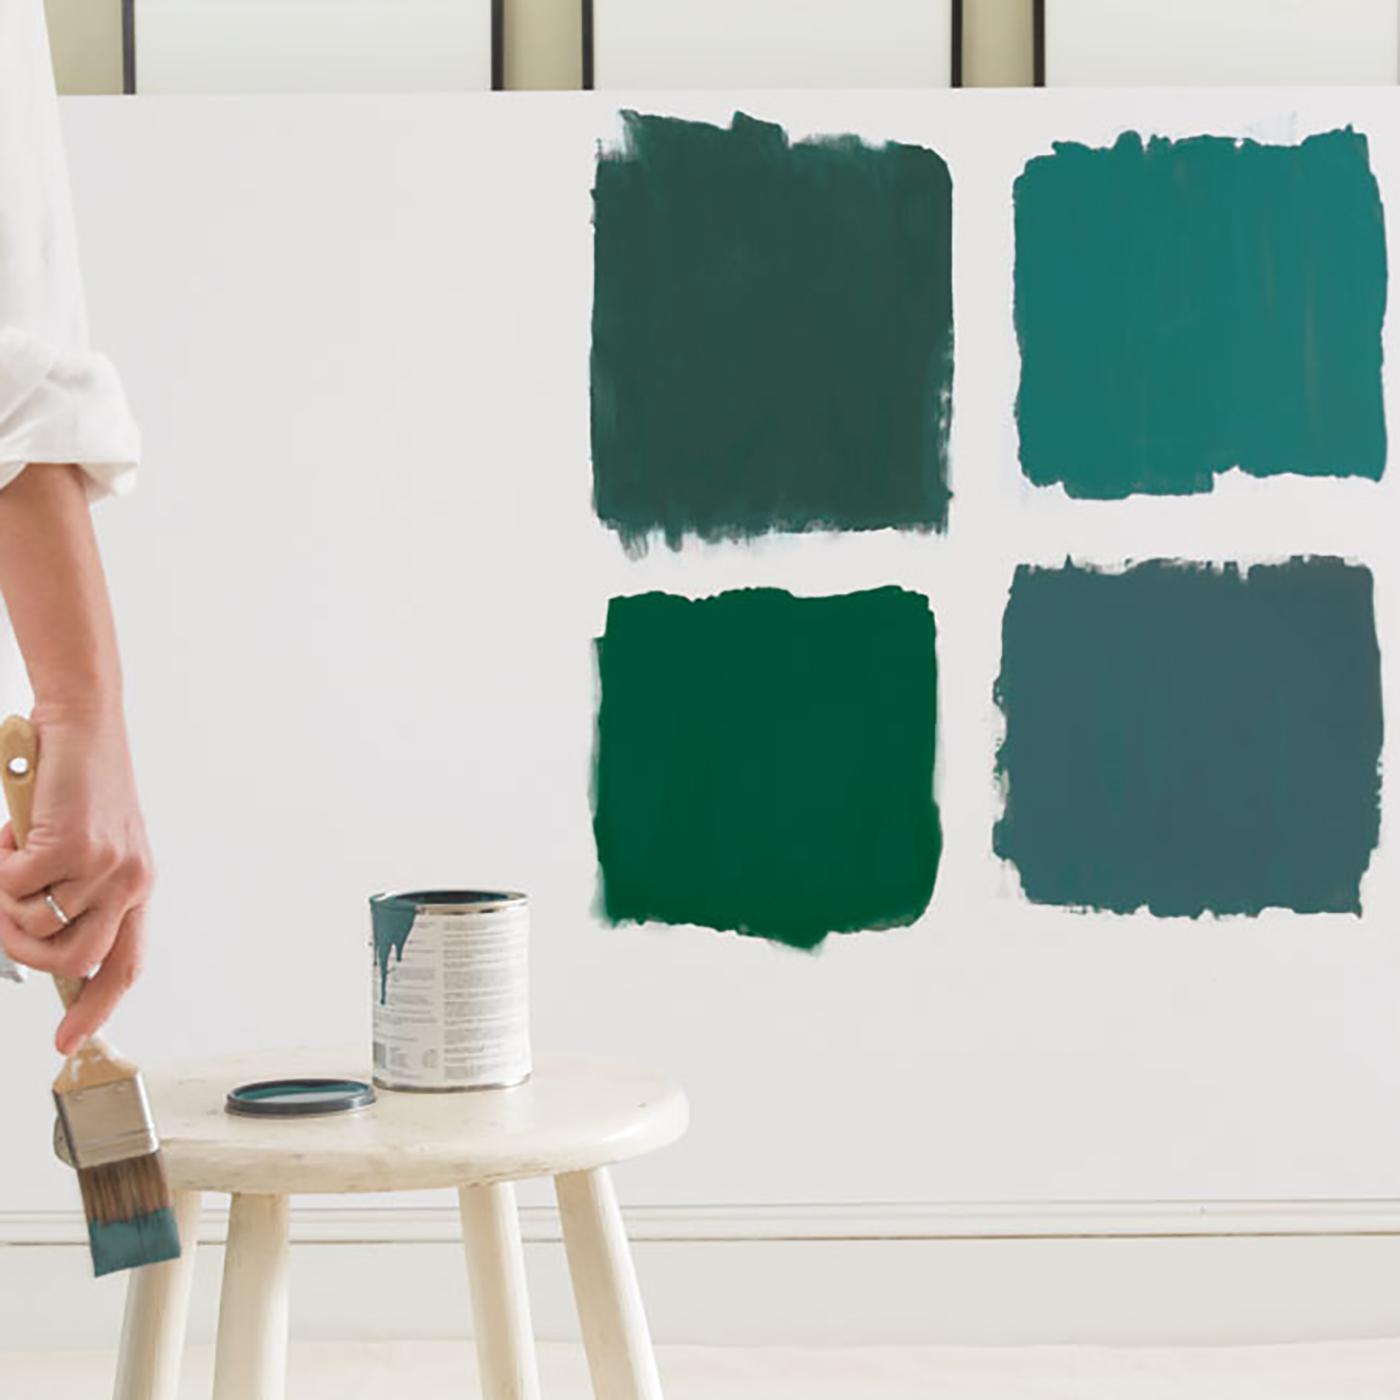 Benjamin Moore paint, color rental